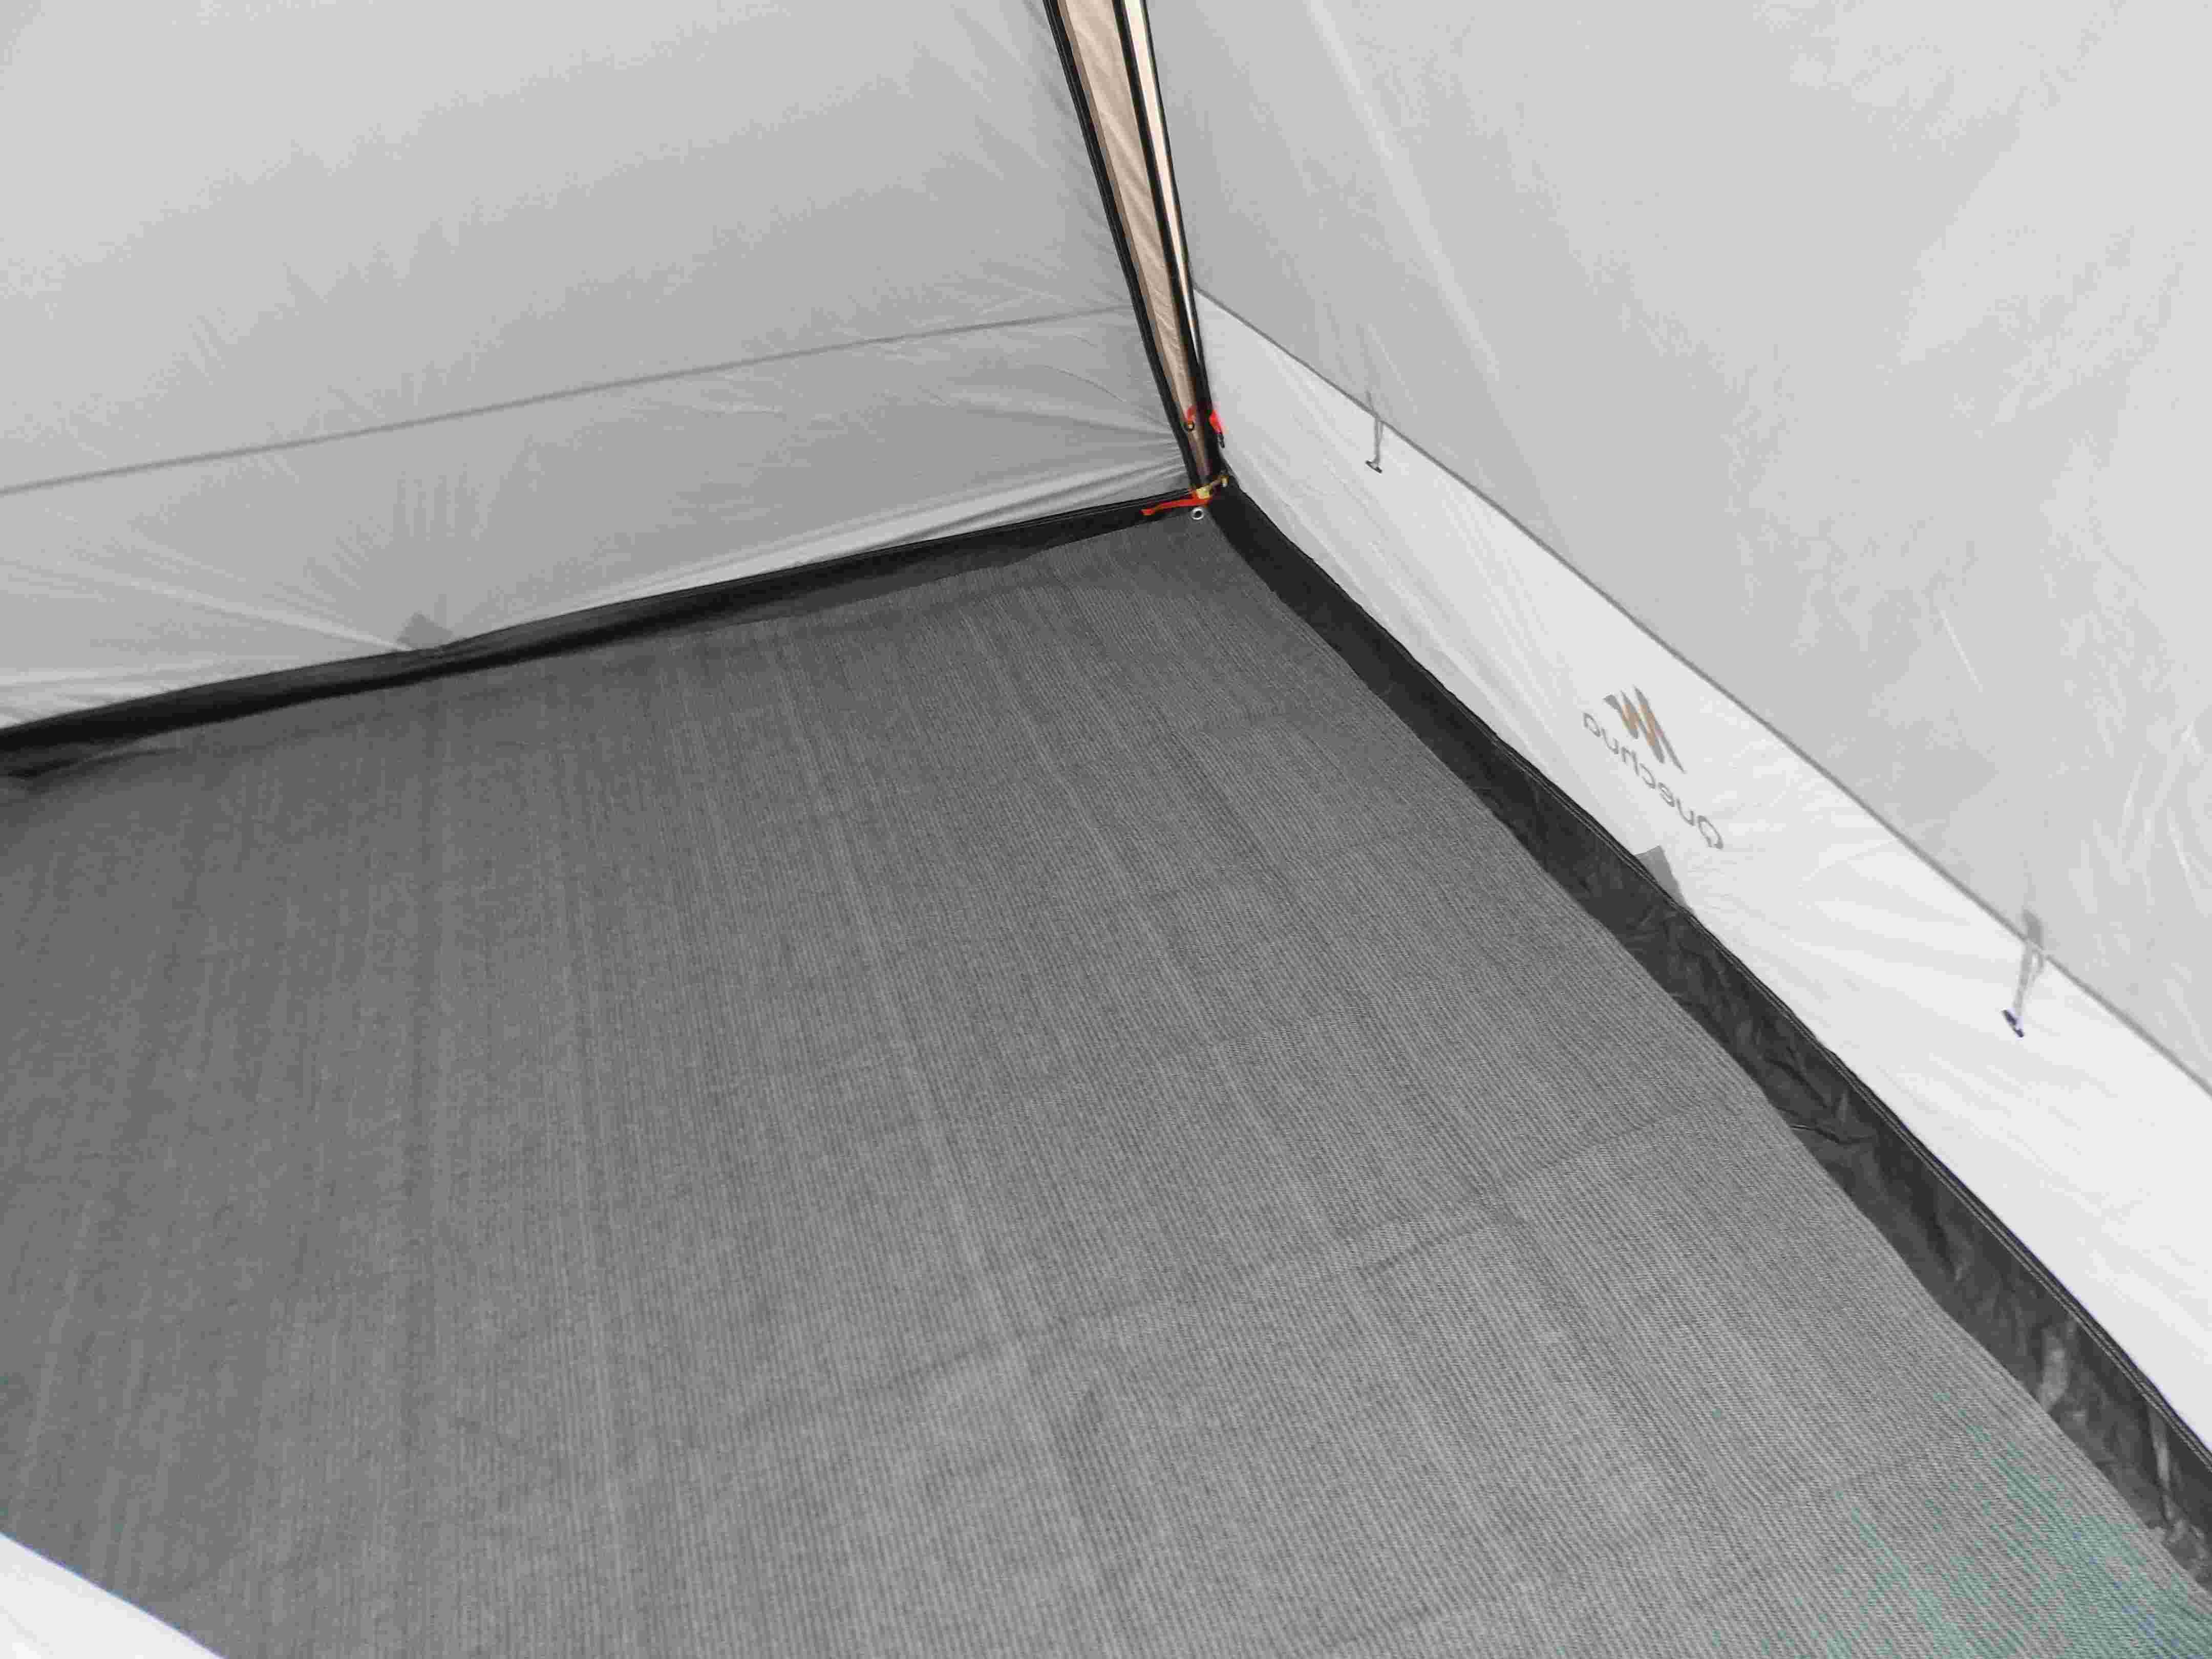 tapis - séjour avec portes quechua + tapis Sam_2313